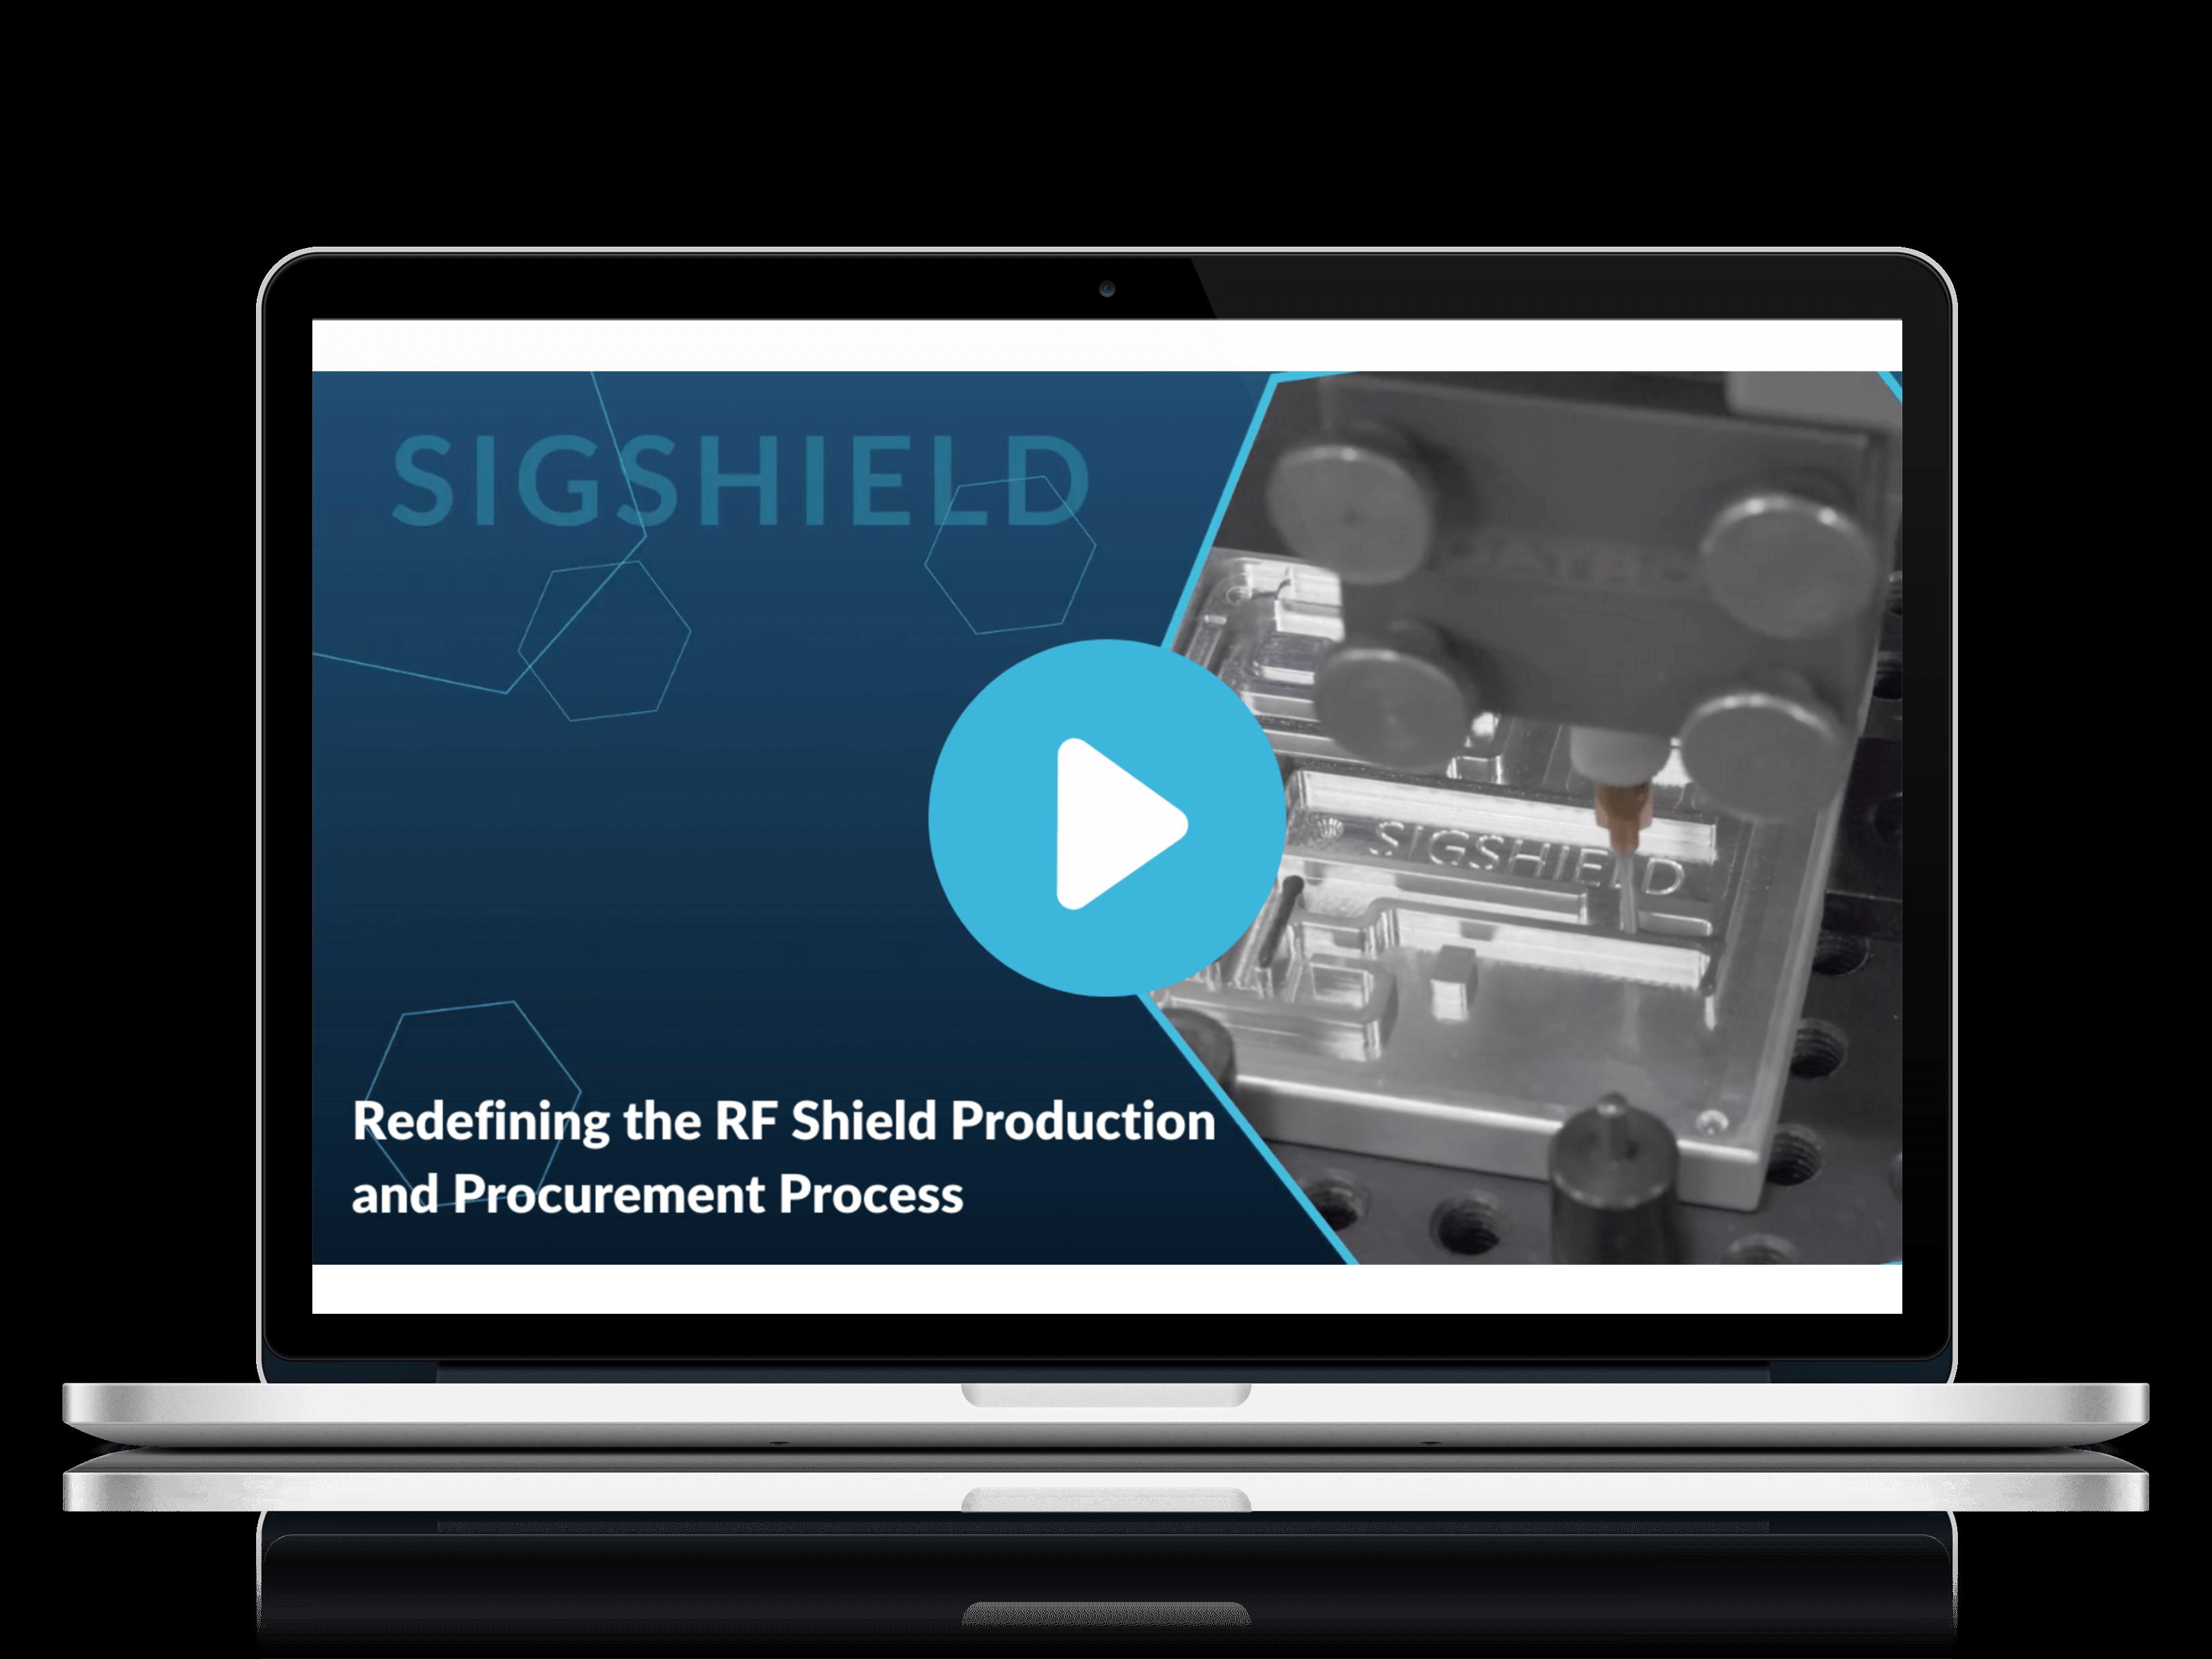 sigshield-video-promo-image